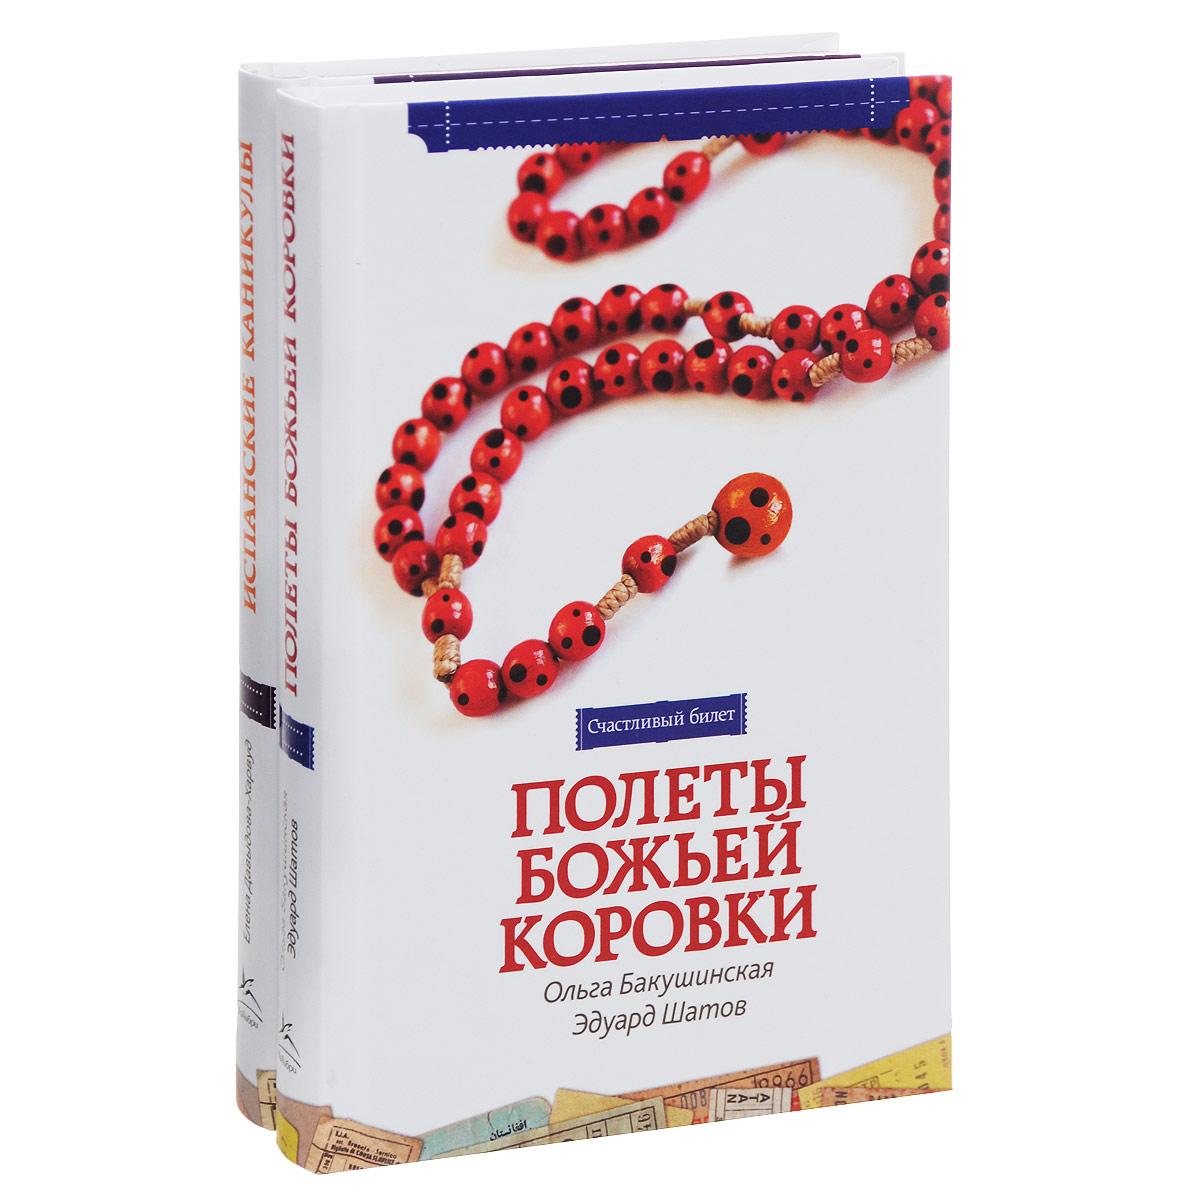 Елена Давыдова-Харвуд, Олга Бакушинская, Эдуард Шатов